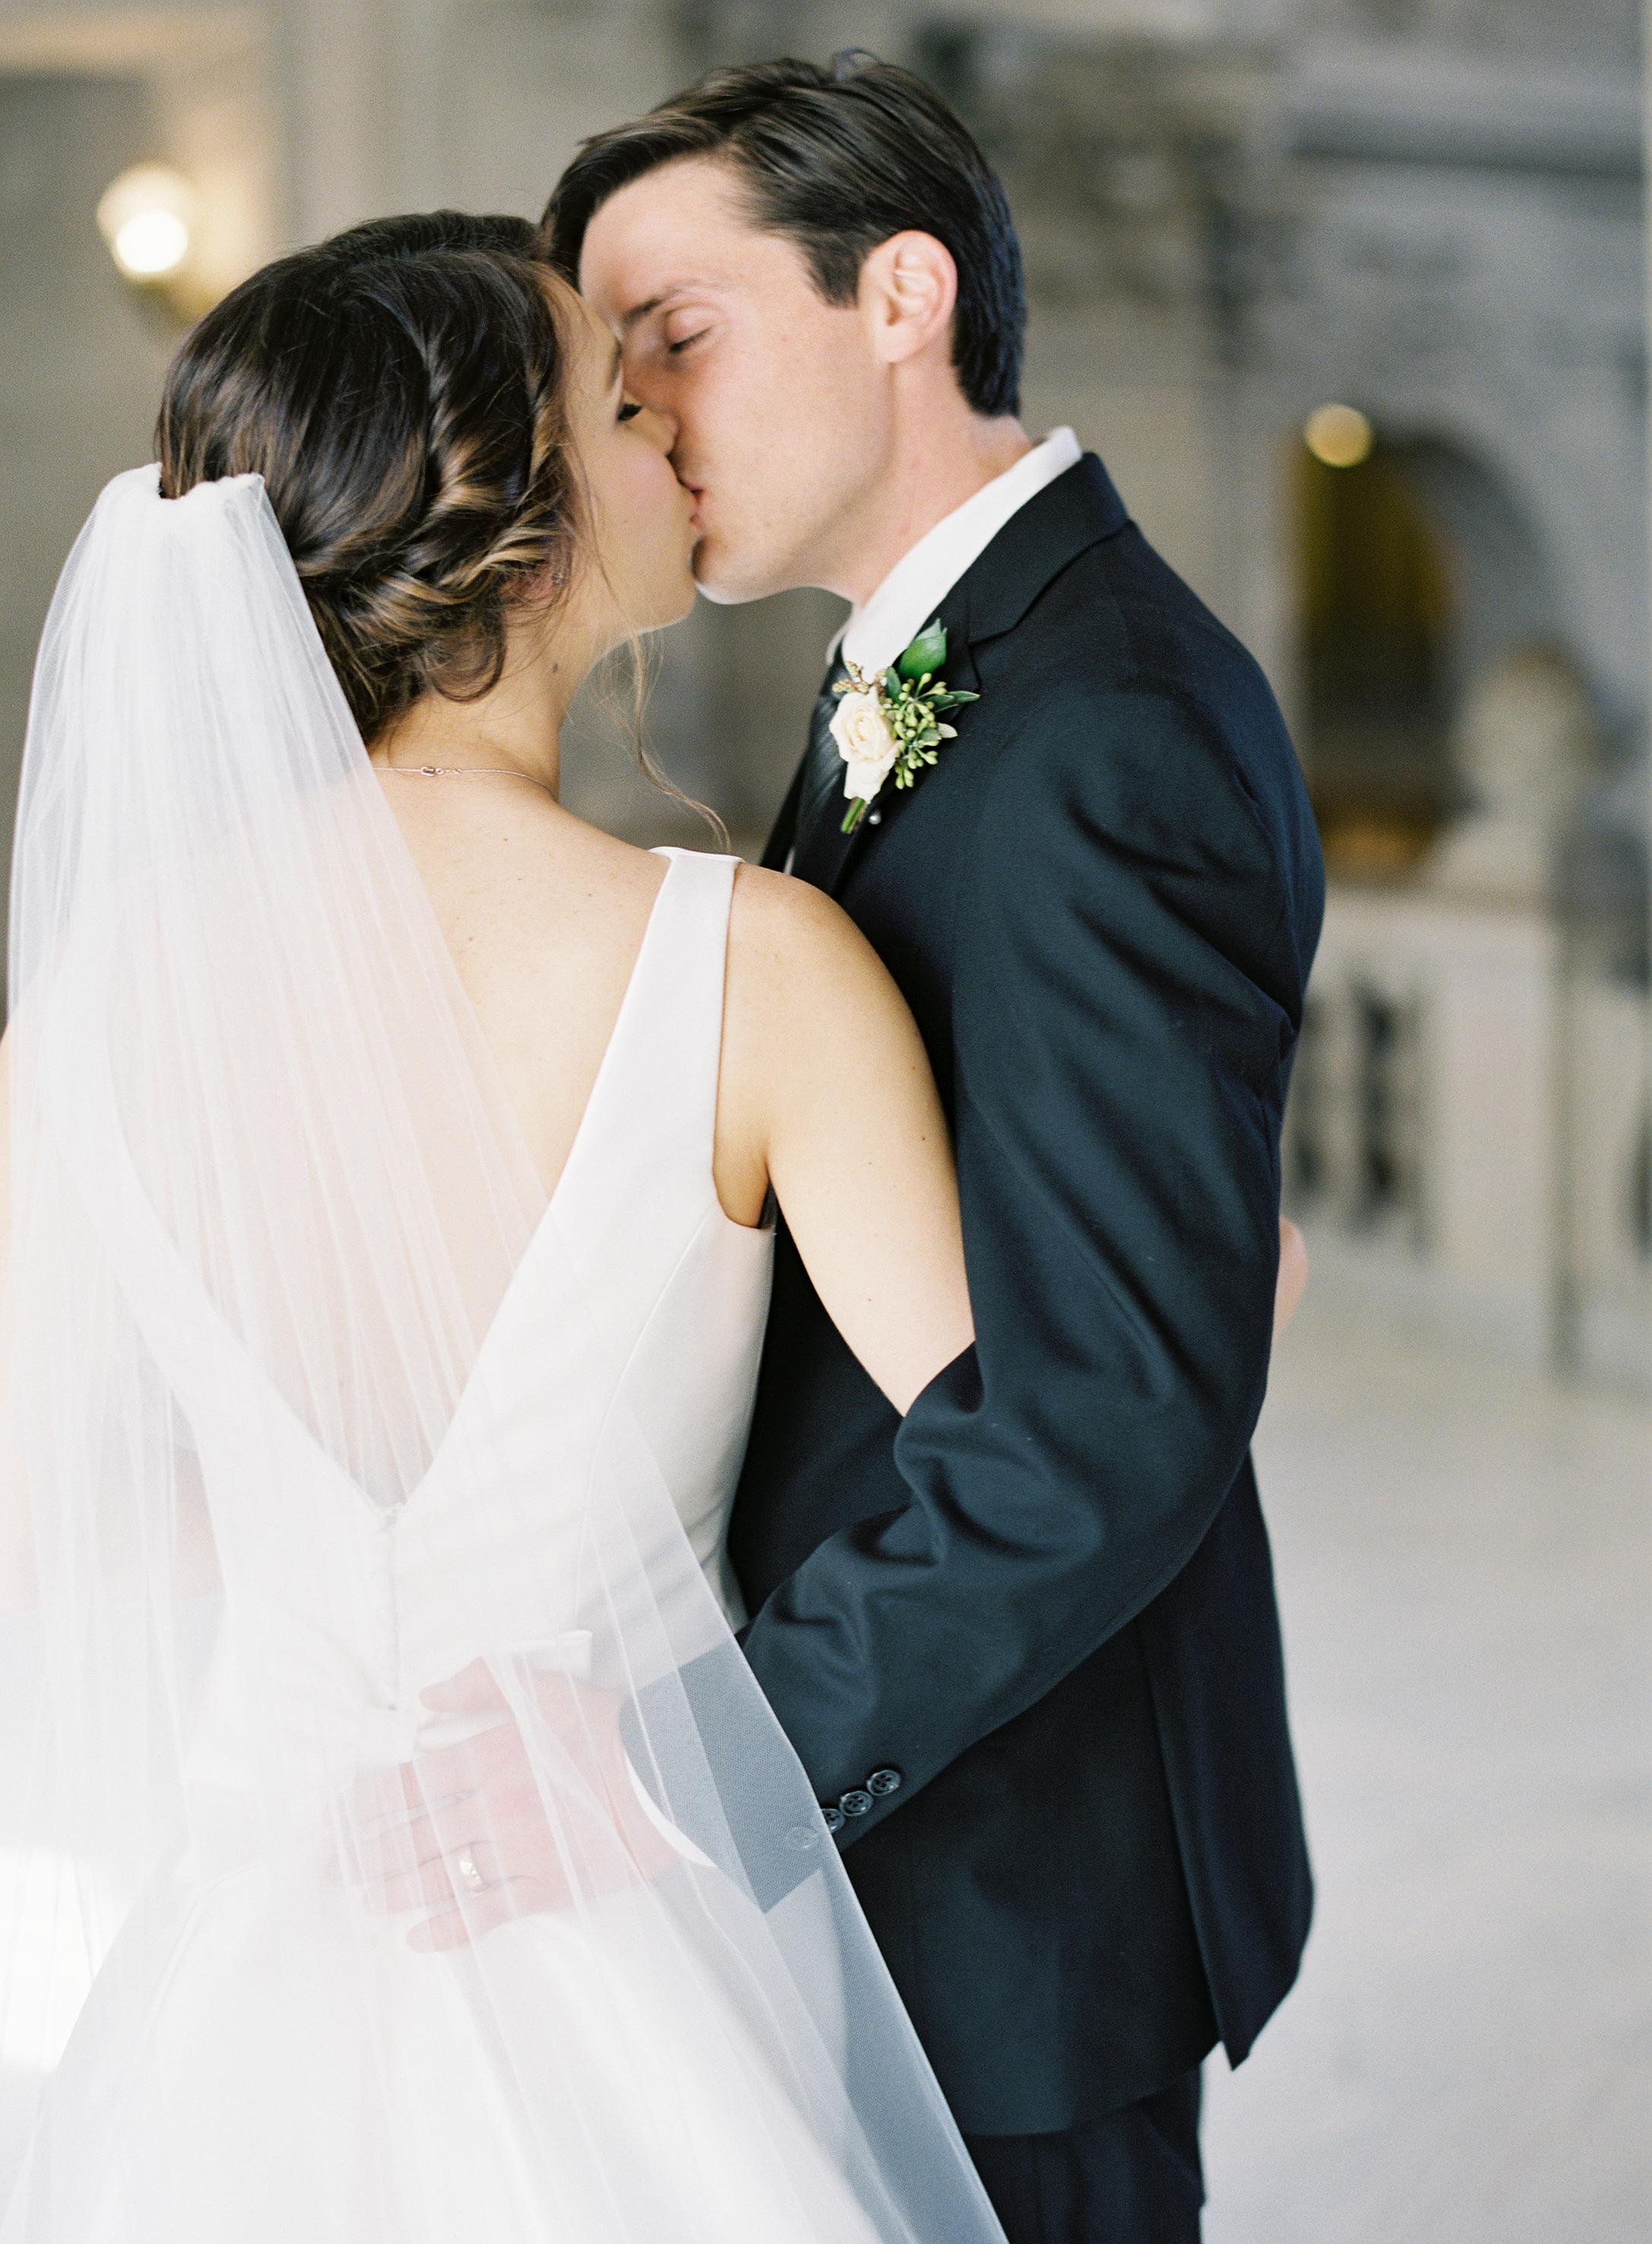 Meghan Mehan Photography - California Wedding Photographer | San Francisco City Hall Wedding 020.jpg